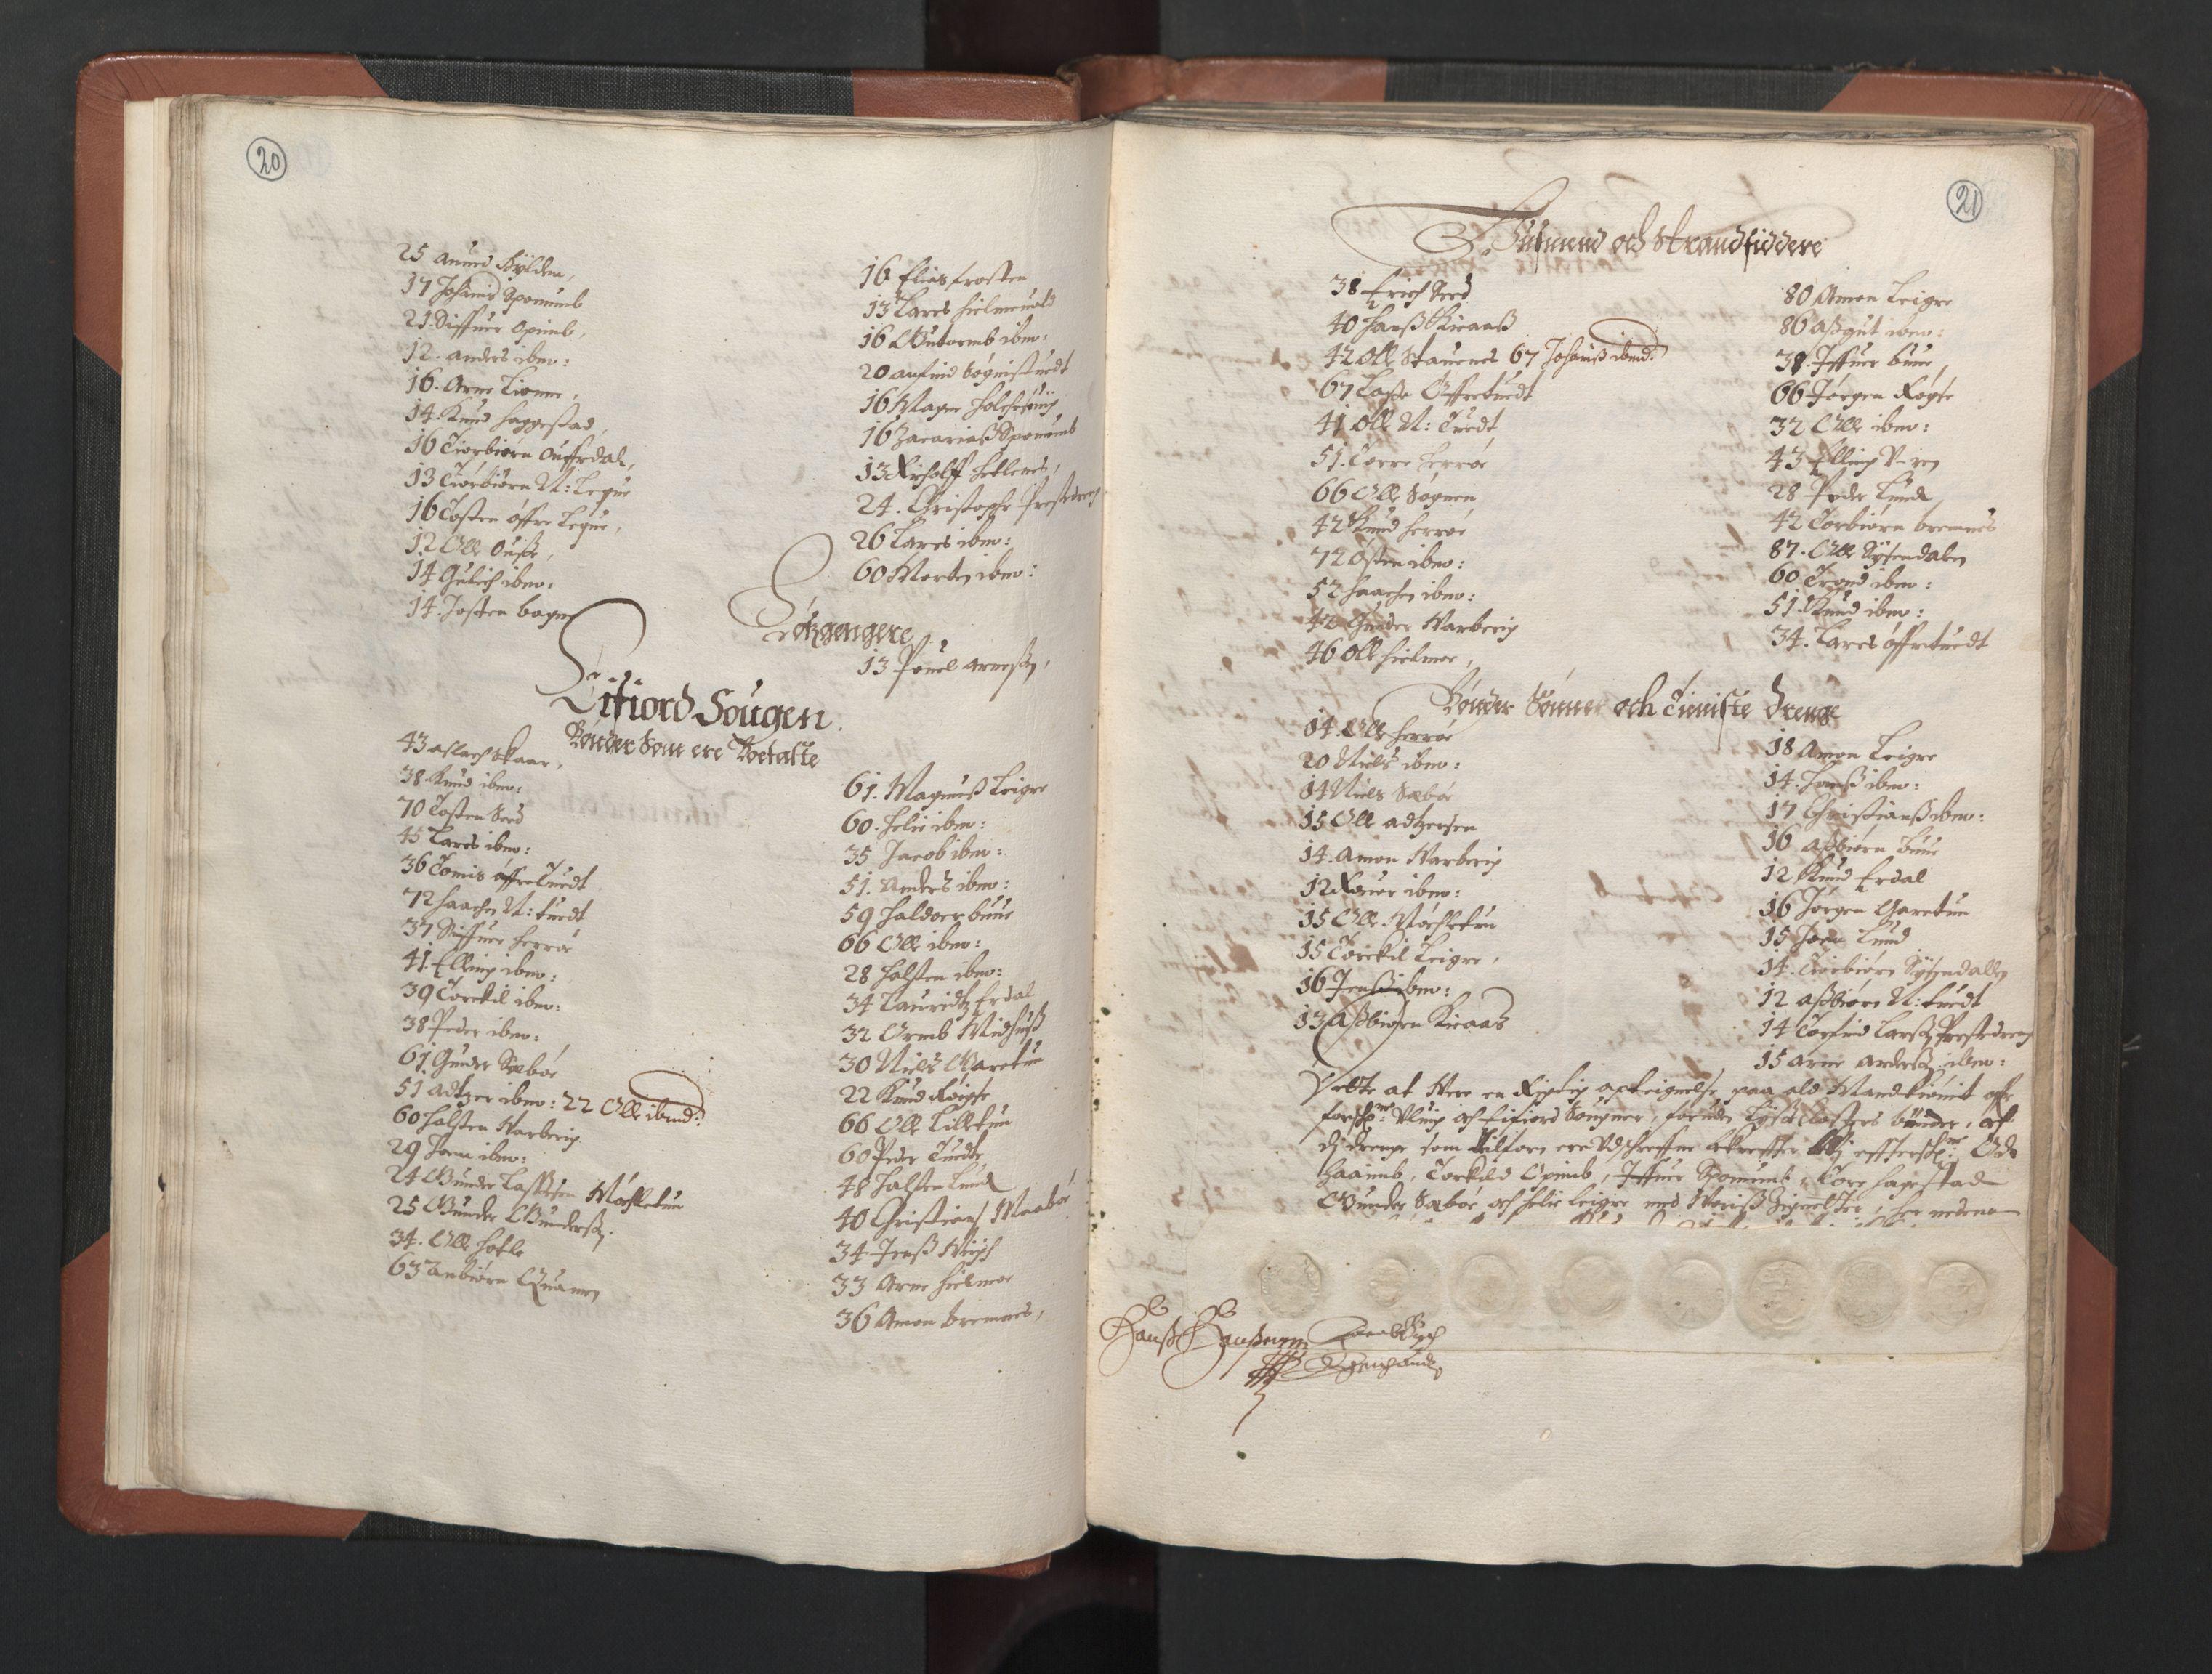 RA, Fogdenes og sorenskrivernes manntall 1664-1666, nr. 14: Hardanger len, Ytre Sogn fogderi og Indre Sogn fogderi, 1664-1665, s. 20-21